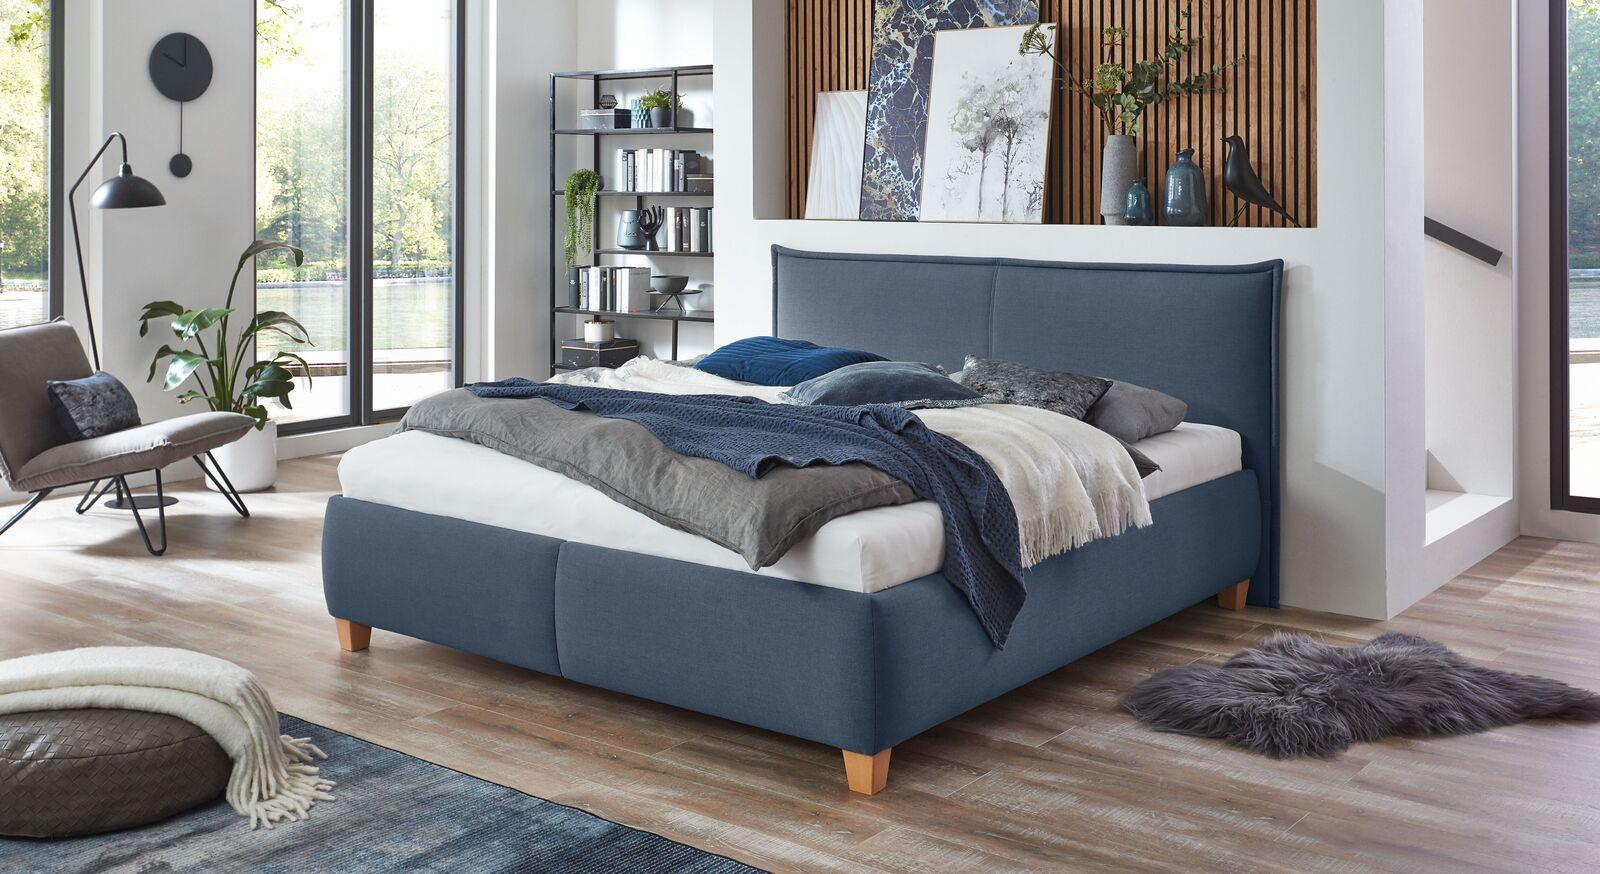 Bett Adana mit Webstoff in Blau